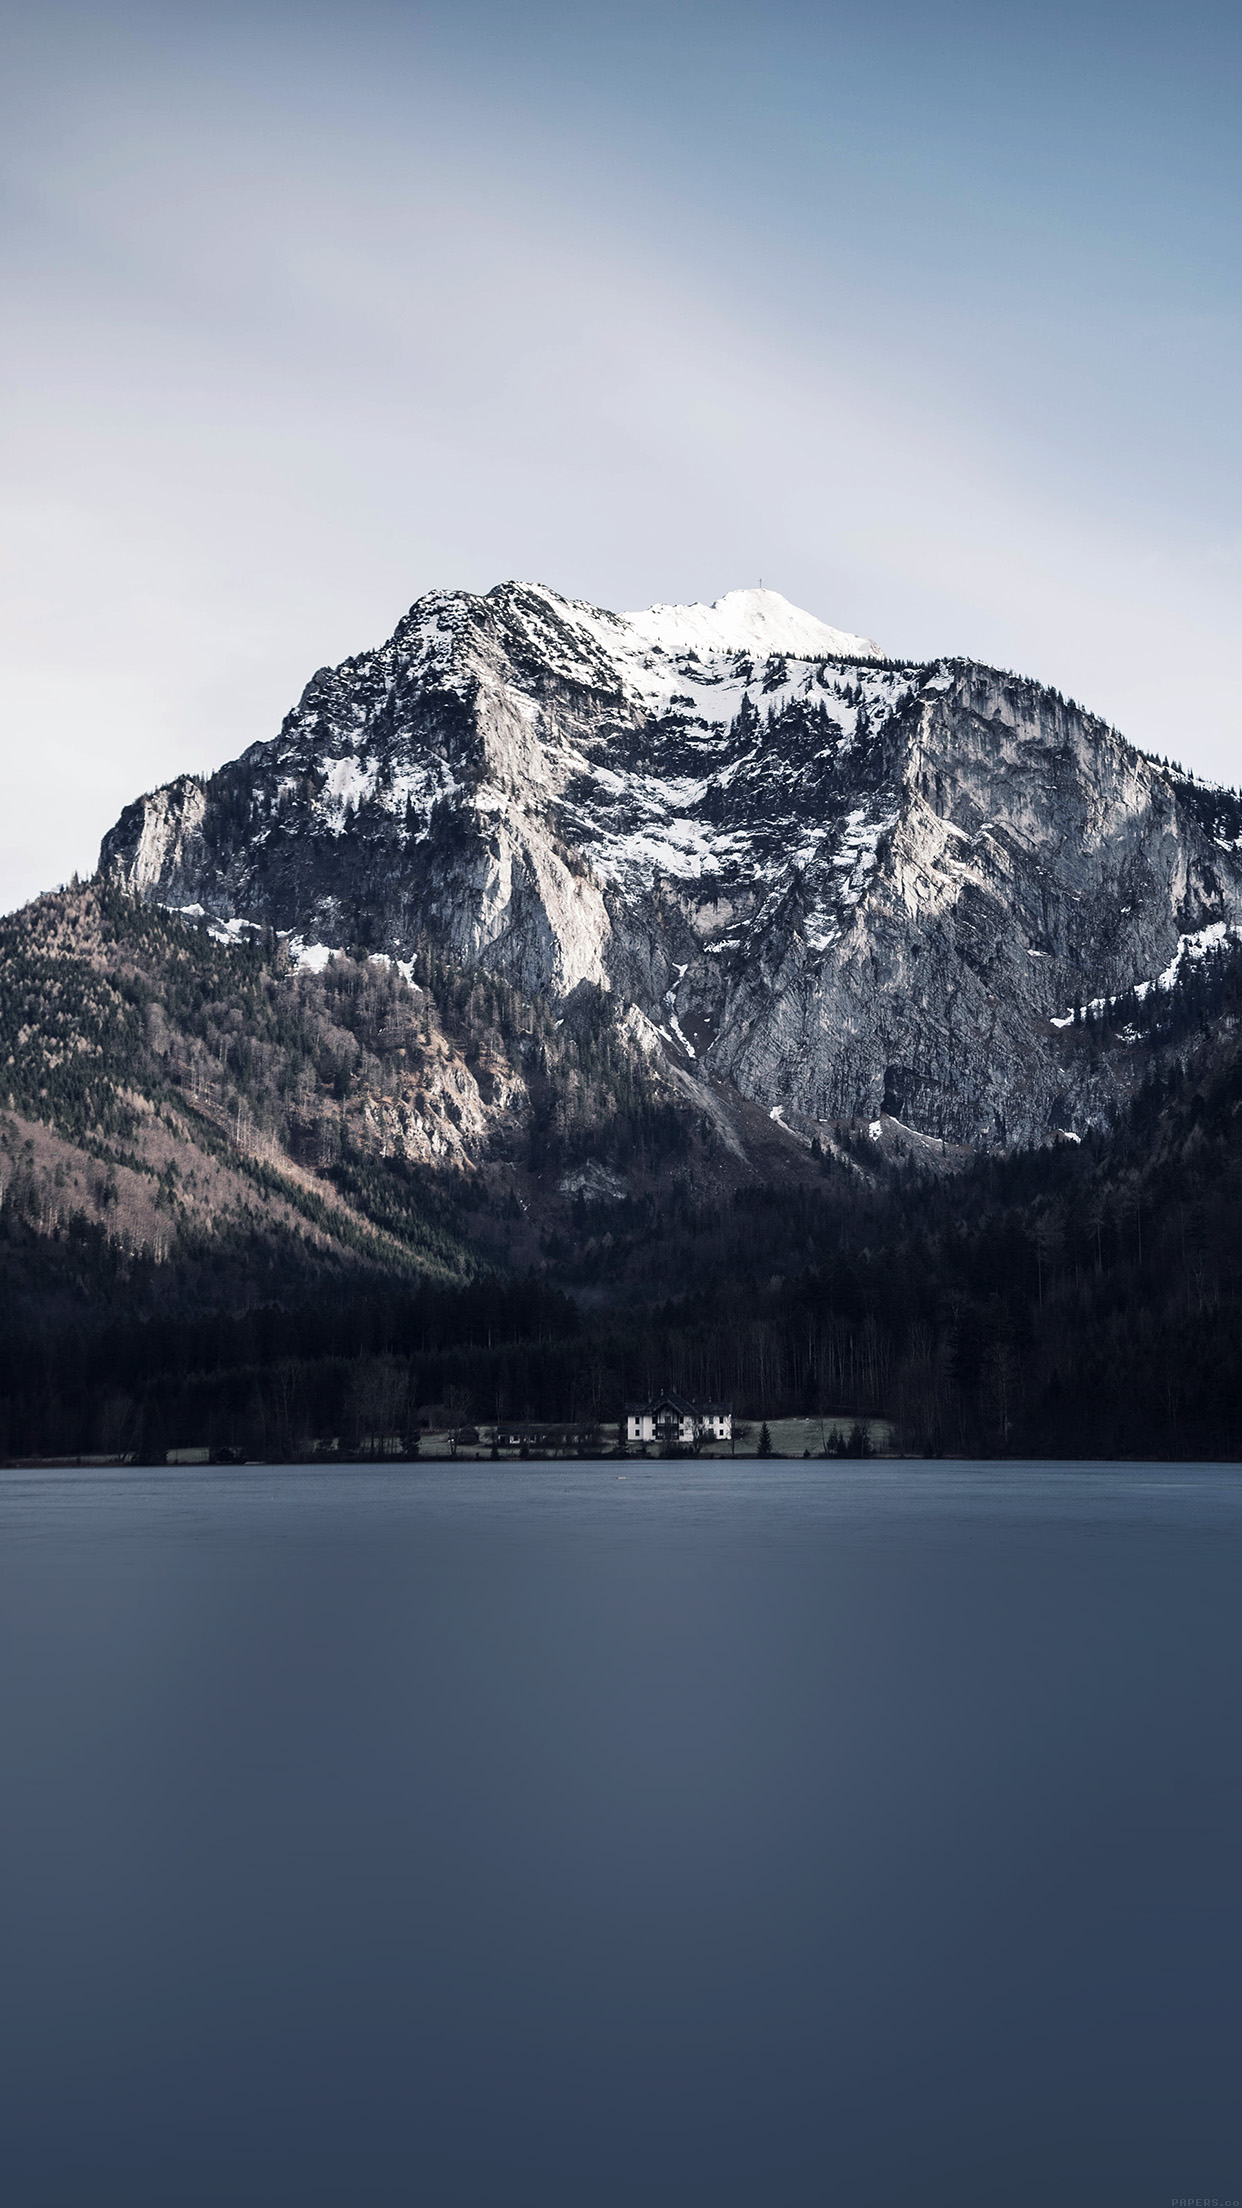 Iphone7papers Mi98 Mountain Lake View Paul E Harrer Nature